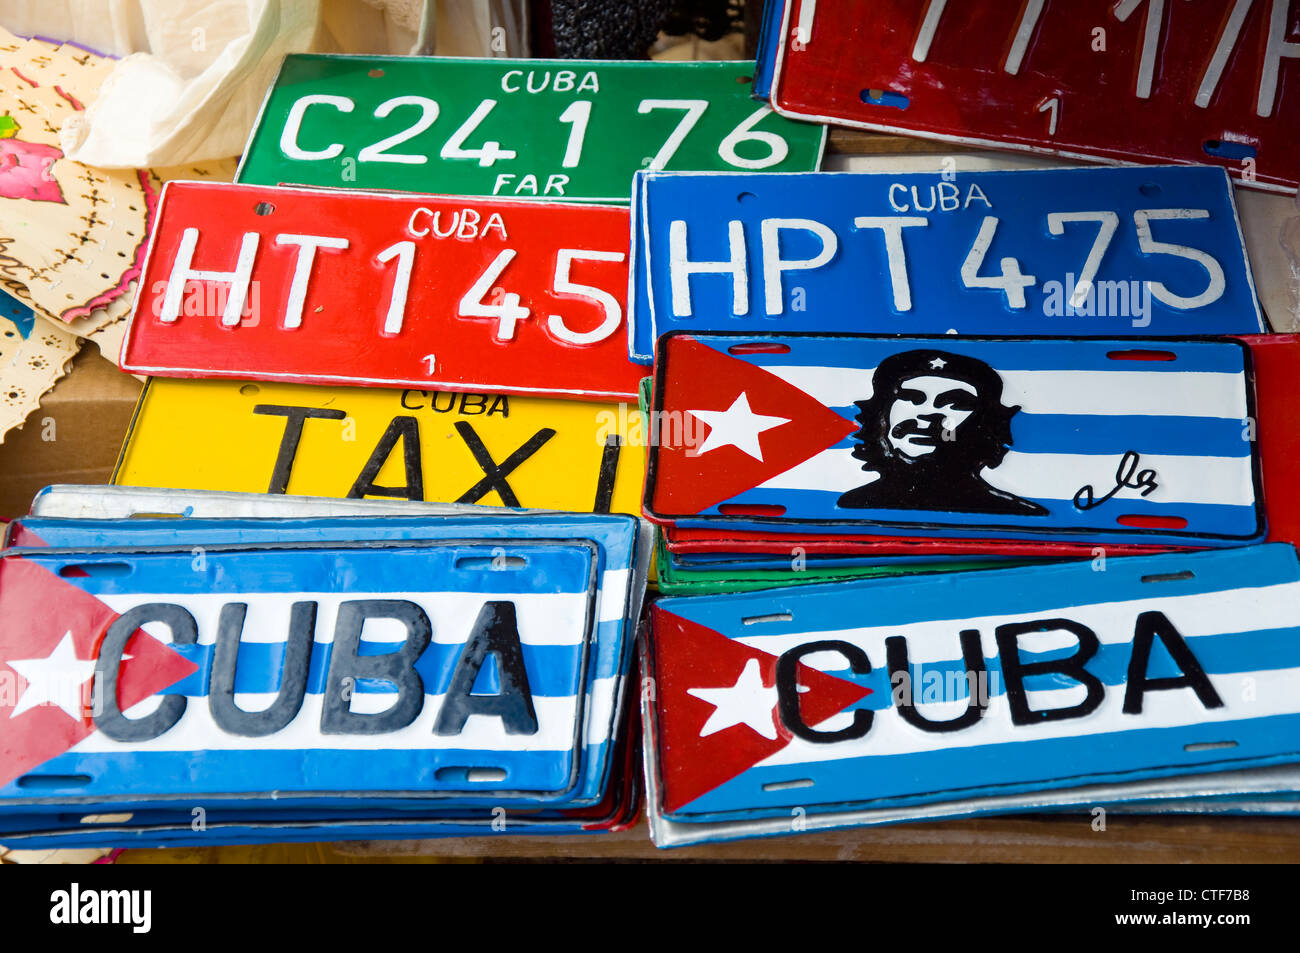 Plates Stockfotos & Plates Bilder - Alamy